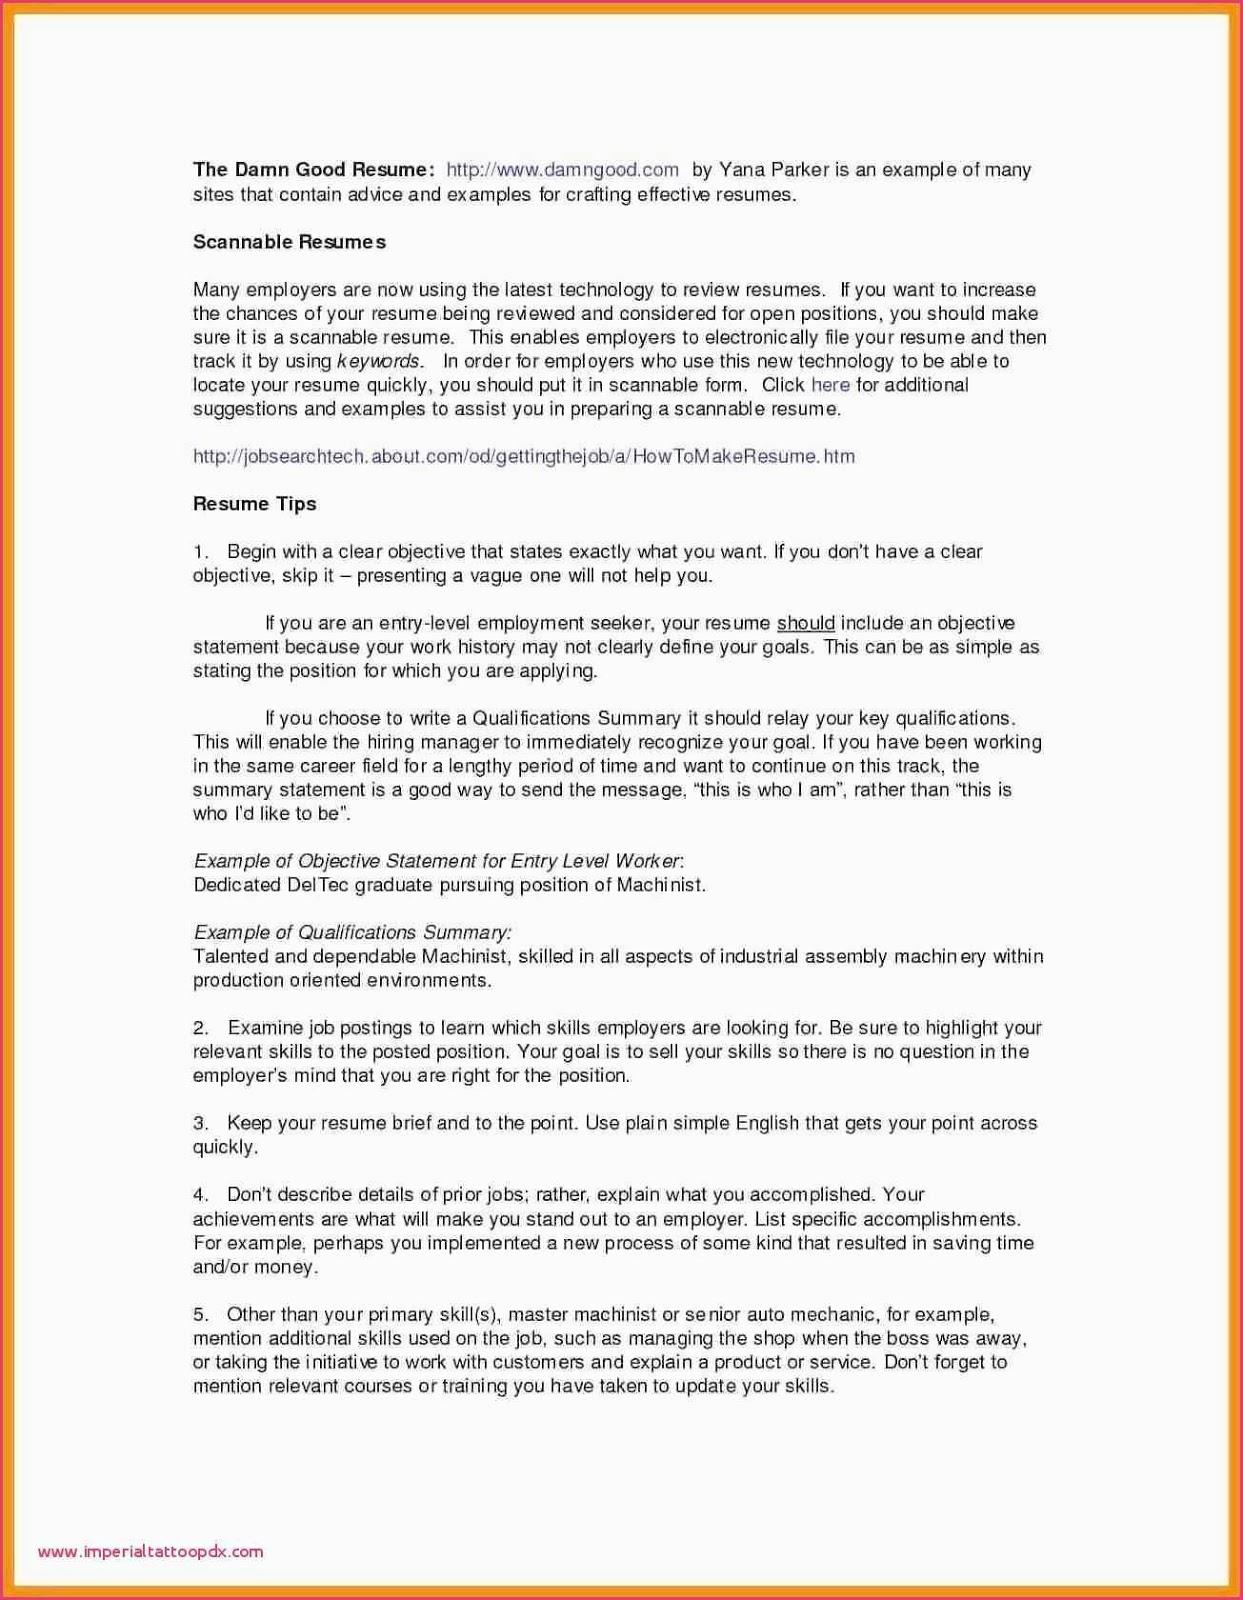 bartending resume samples bartender resume samples 2019 Bartending Resume Examples Australia 2020 bartender resume sample bartender resume samples templates bartending resume examples bartender resume sample no experience